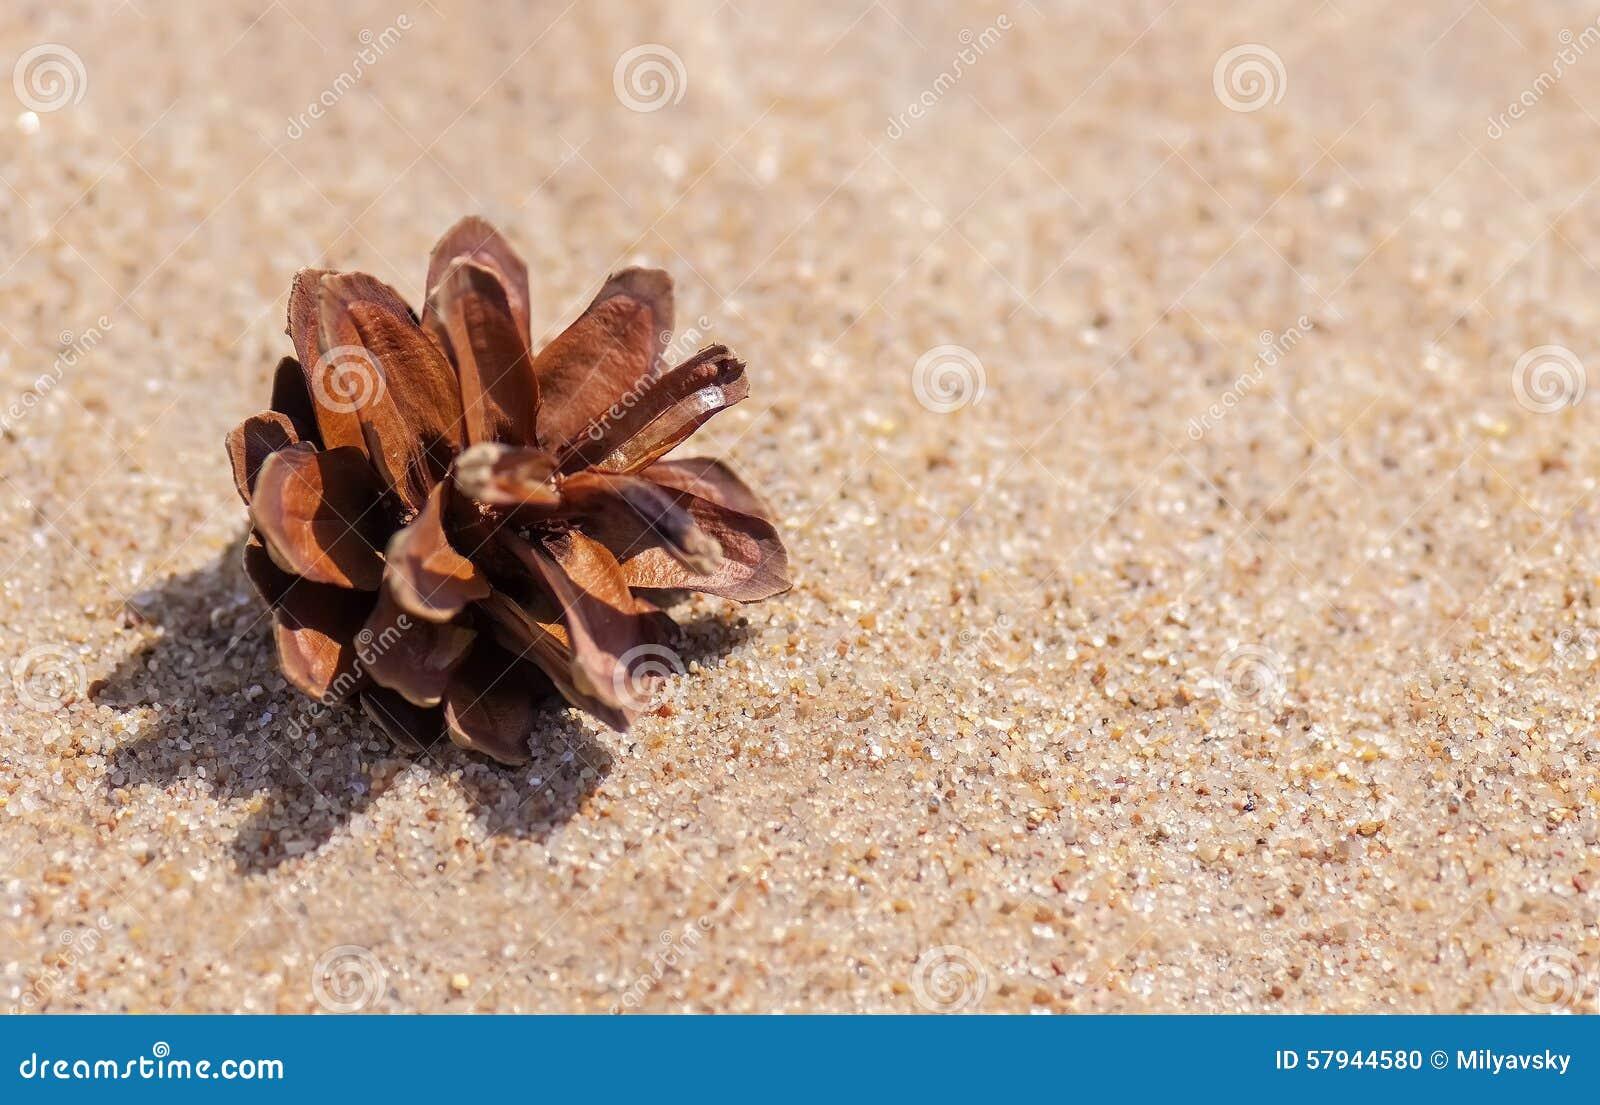 Cône de pin sur un sable